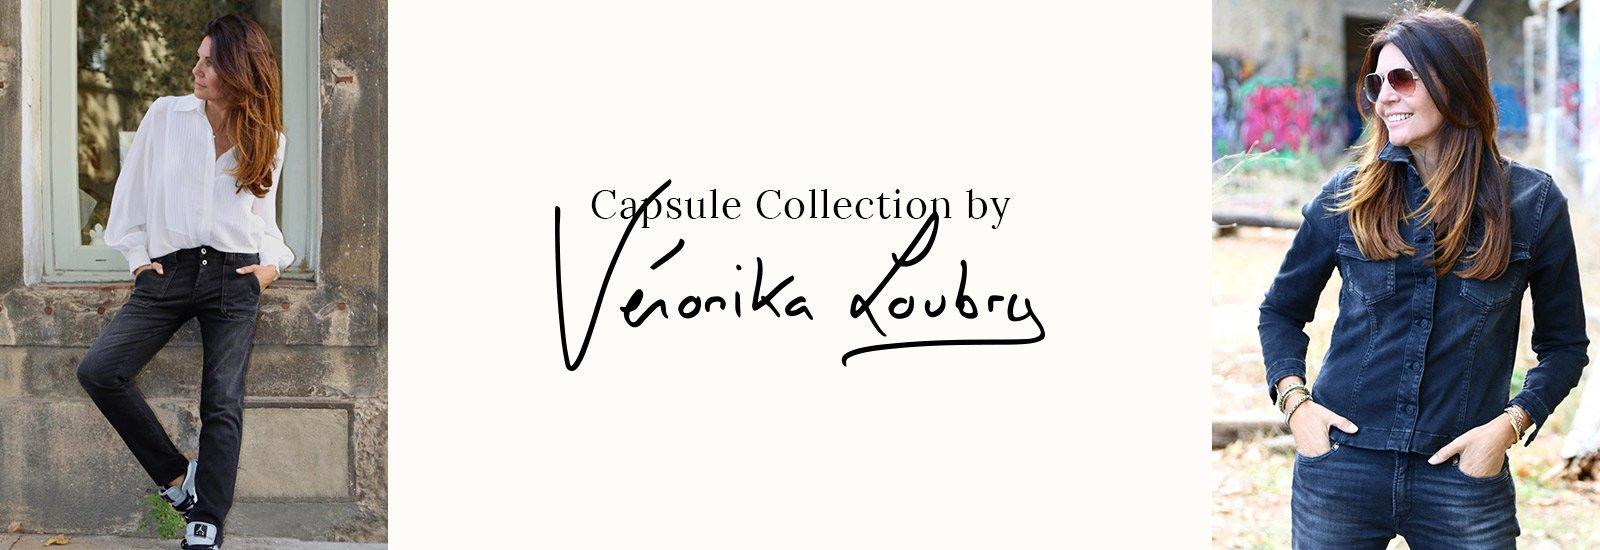 Véronika Loubry capsule